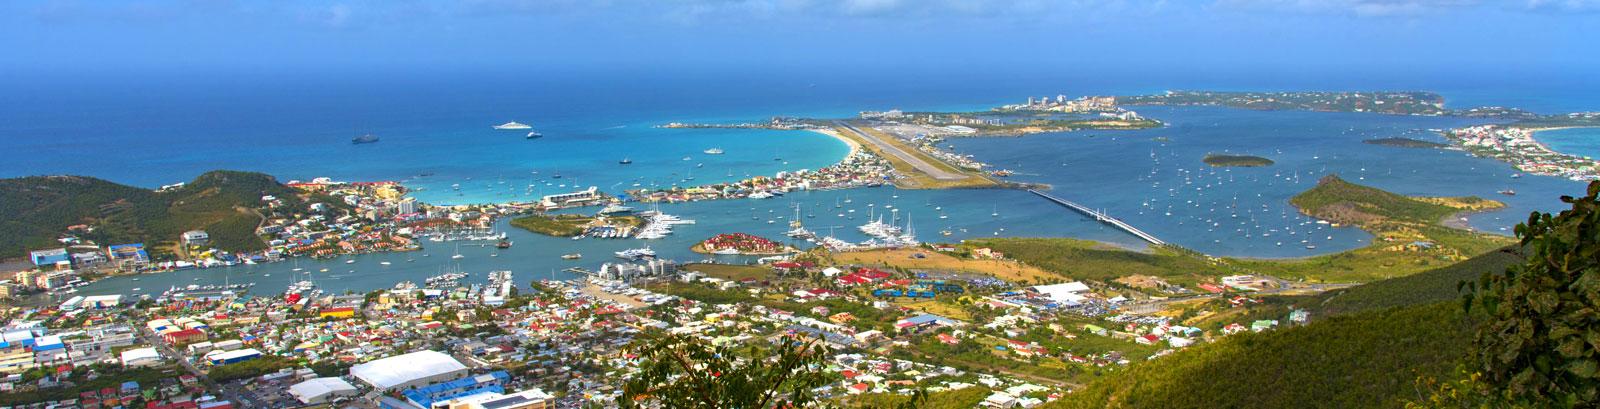 Getting to St. Maarten, Simpson Bay Resort, Marina & Spa